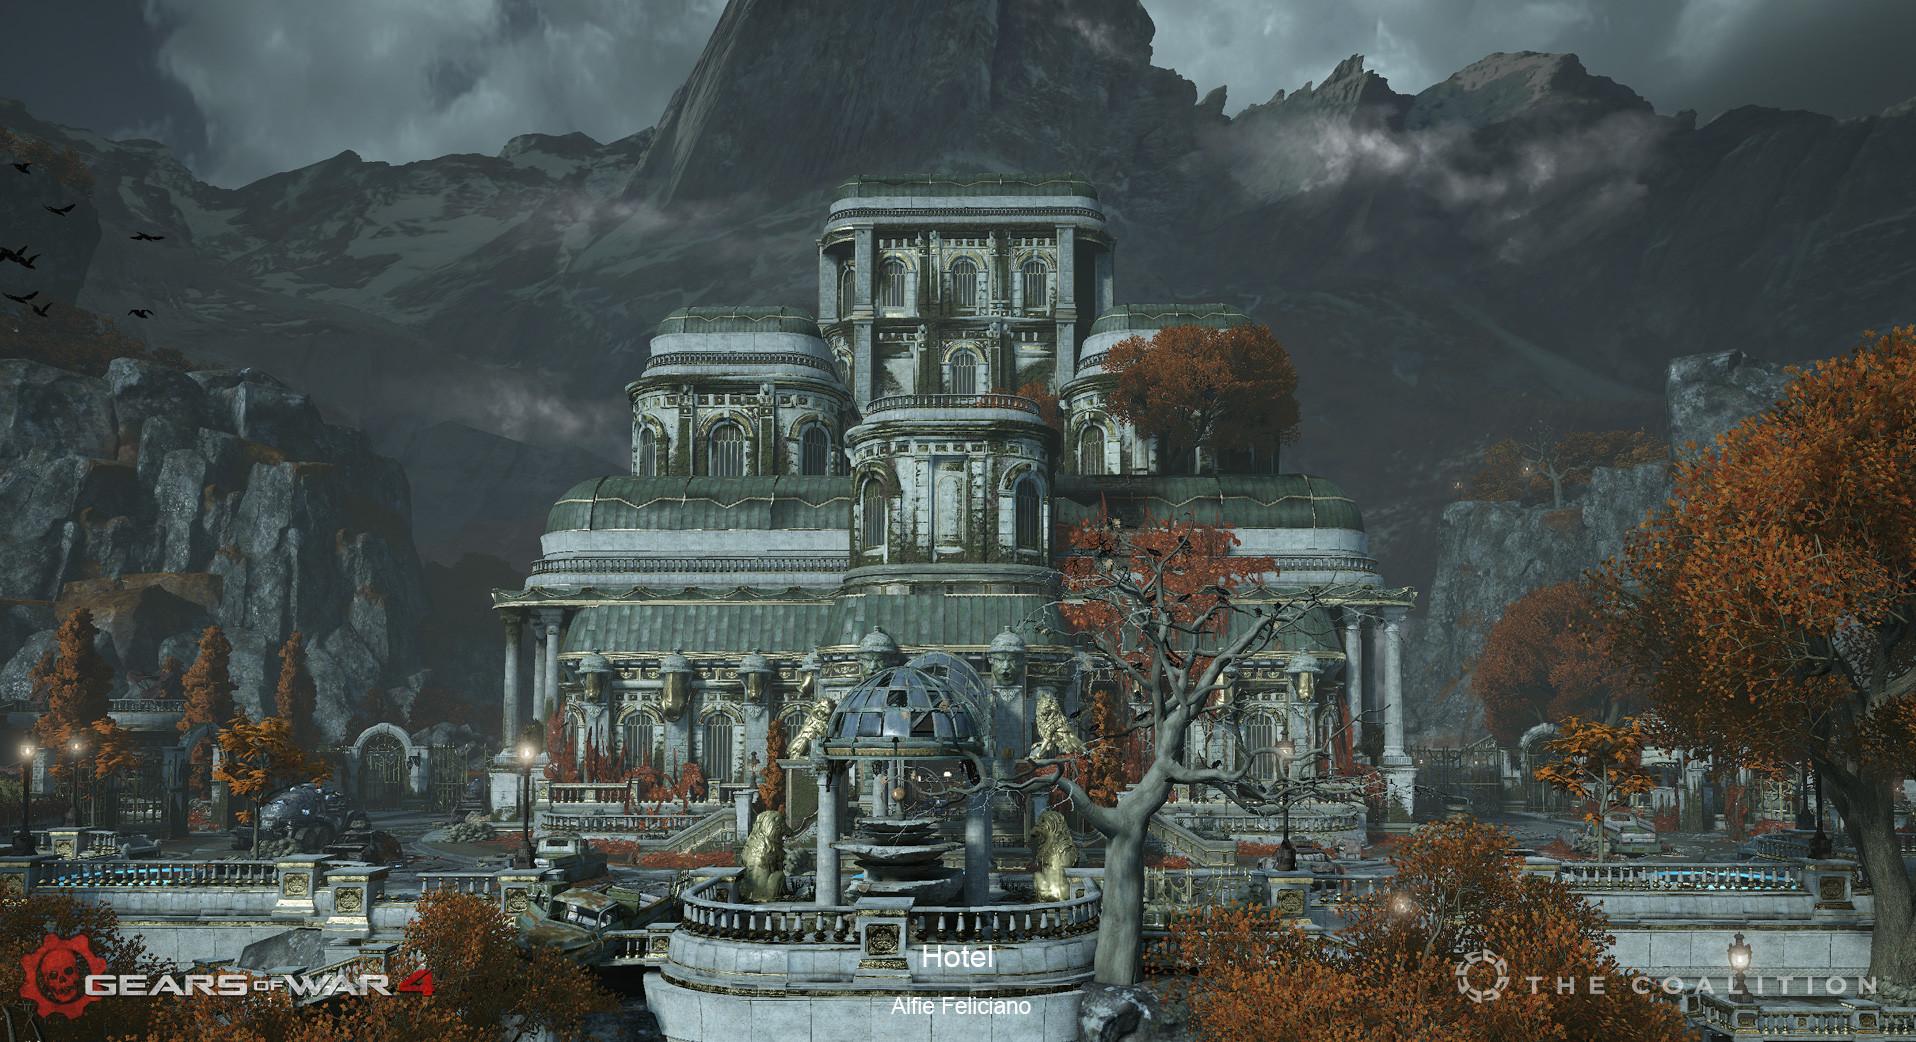 ArtStation - Gears of War 4 DLC (Hotel), Alfie Feliciano